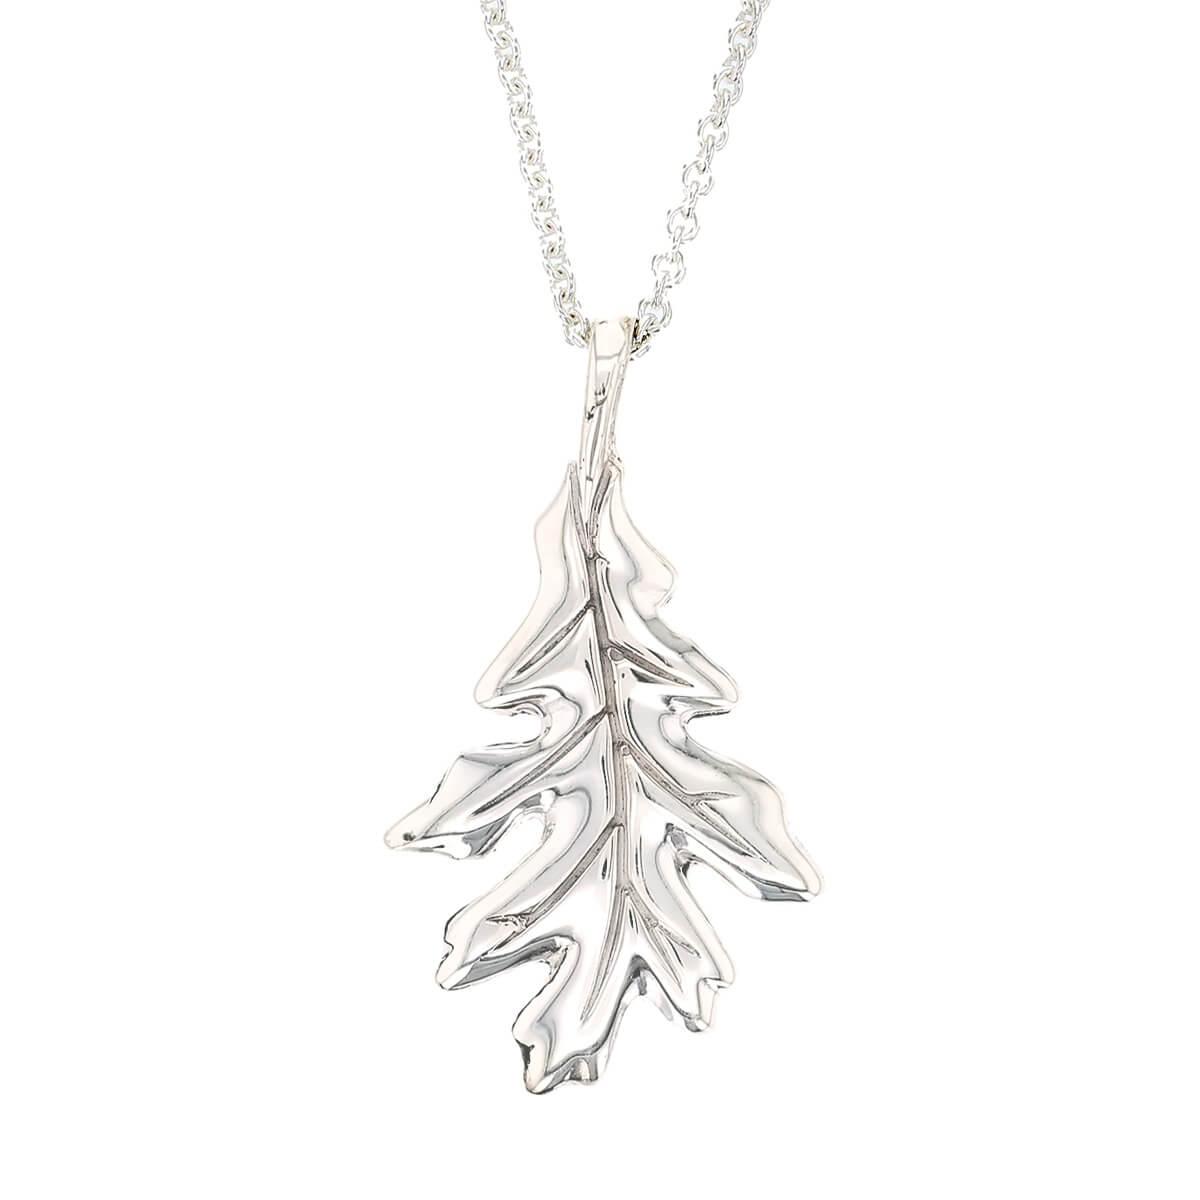 Faller Oakleaf, Derry, Londonderry, Northern Ireland, oak wood, acorn, angel, leaf, St Columba, St. Comcille, christian, heritage, historical, sterling silver pendant